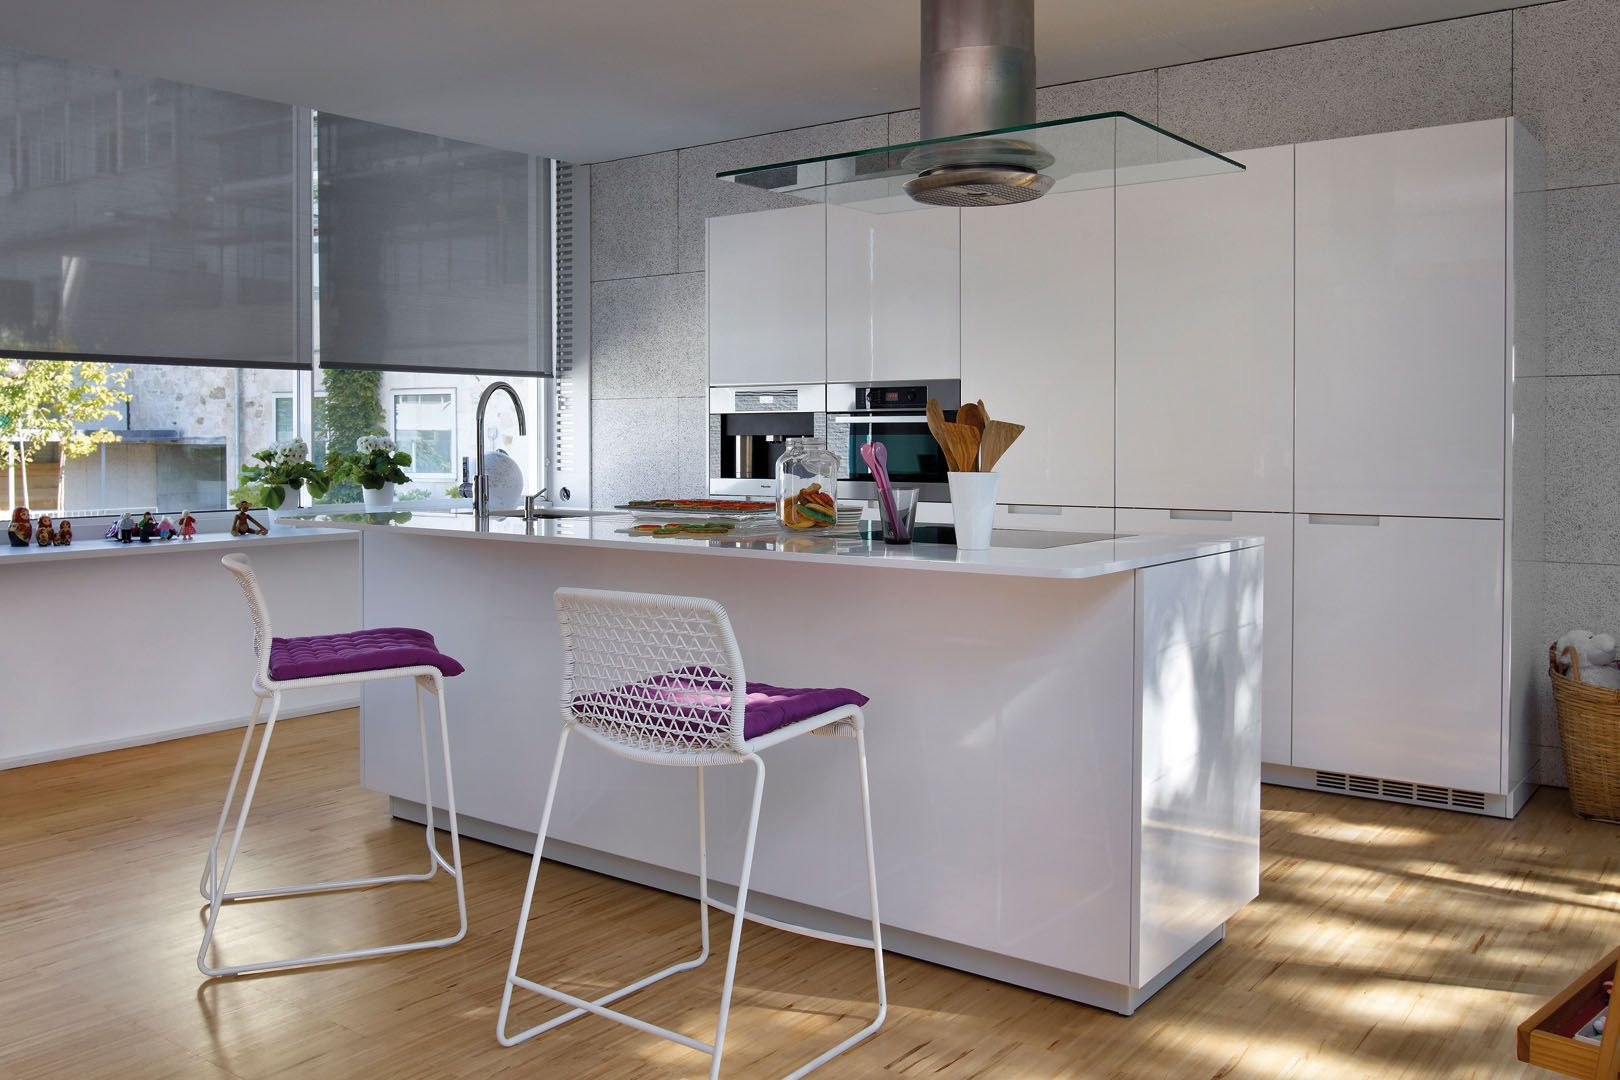 Cocina blanca con isla minimalista in 2019 Aluminium